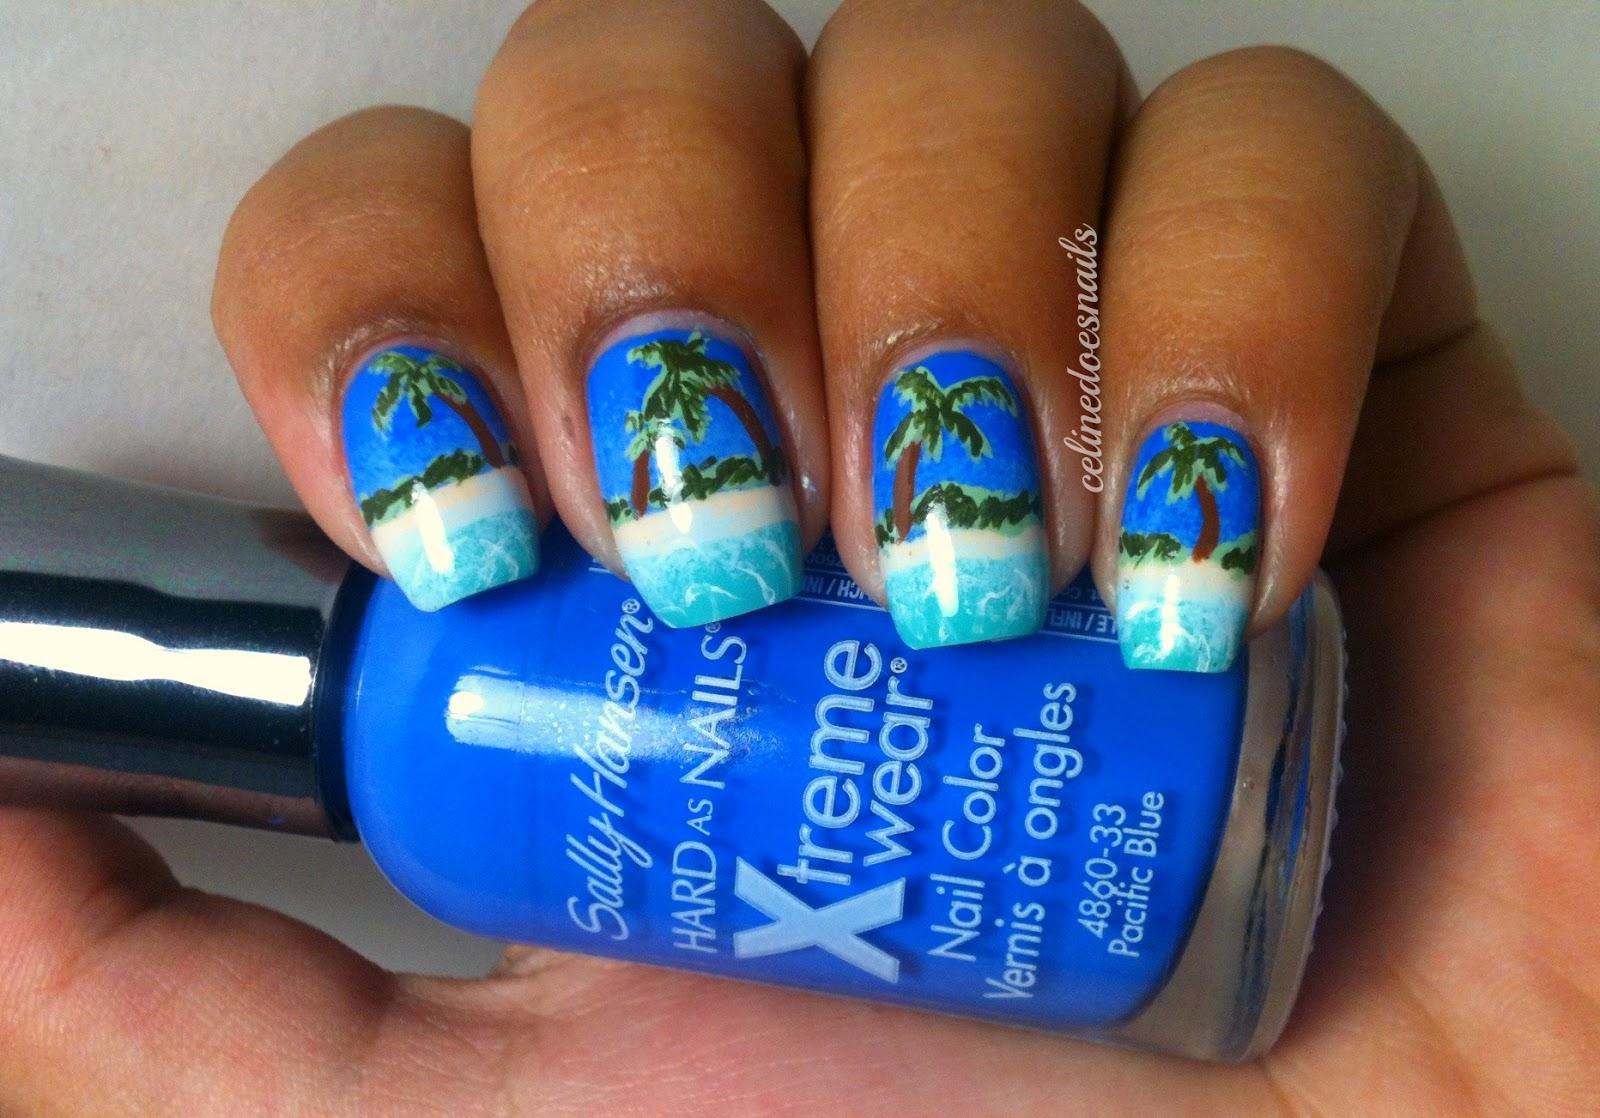 Nails By Celine: July 2013